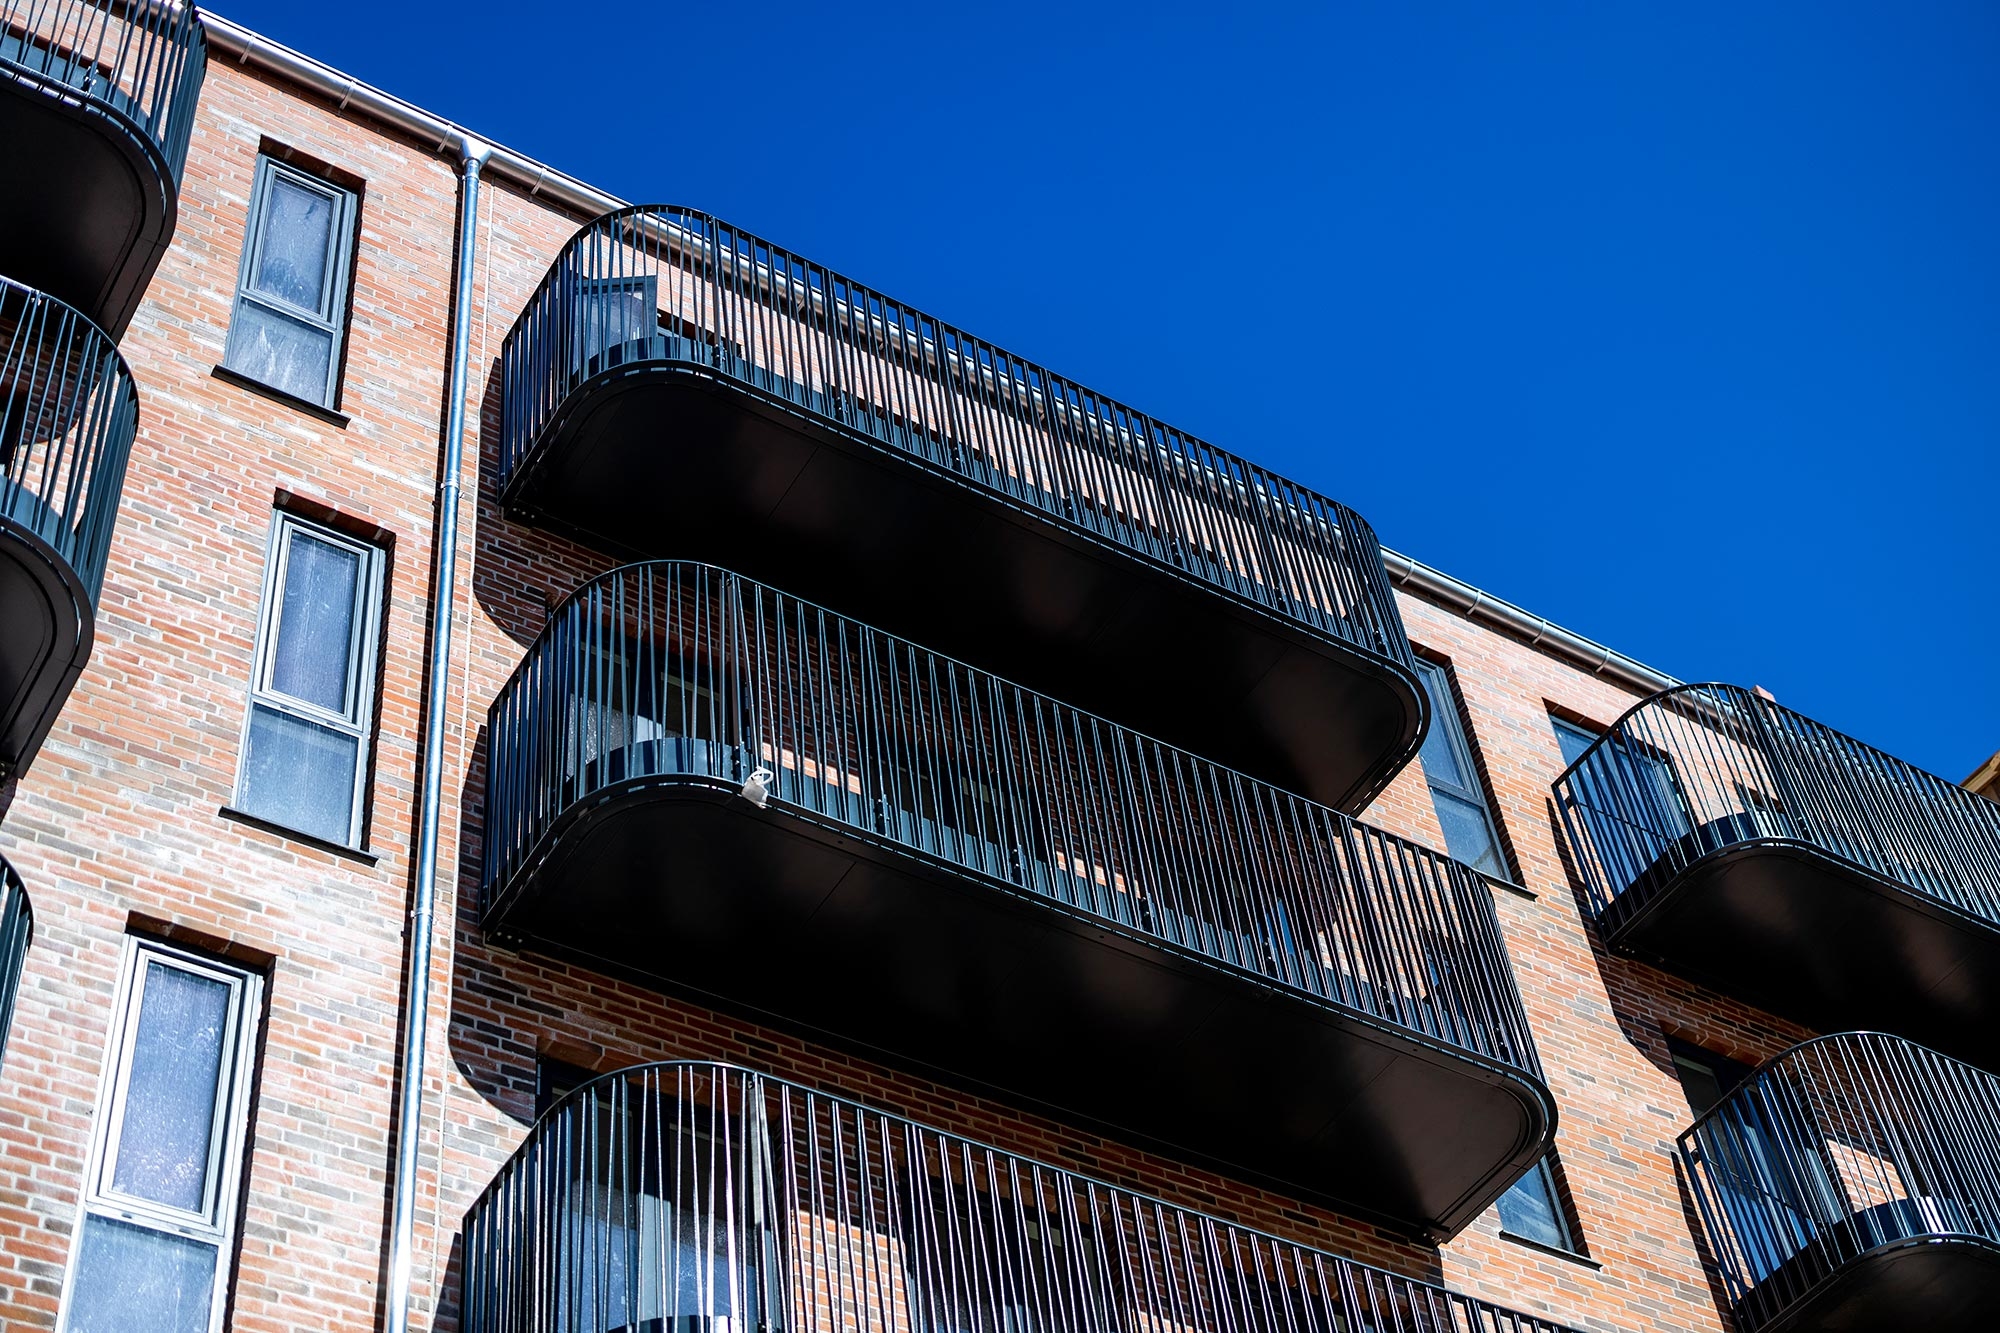 Bygning med altaner